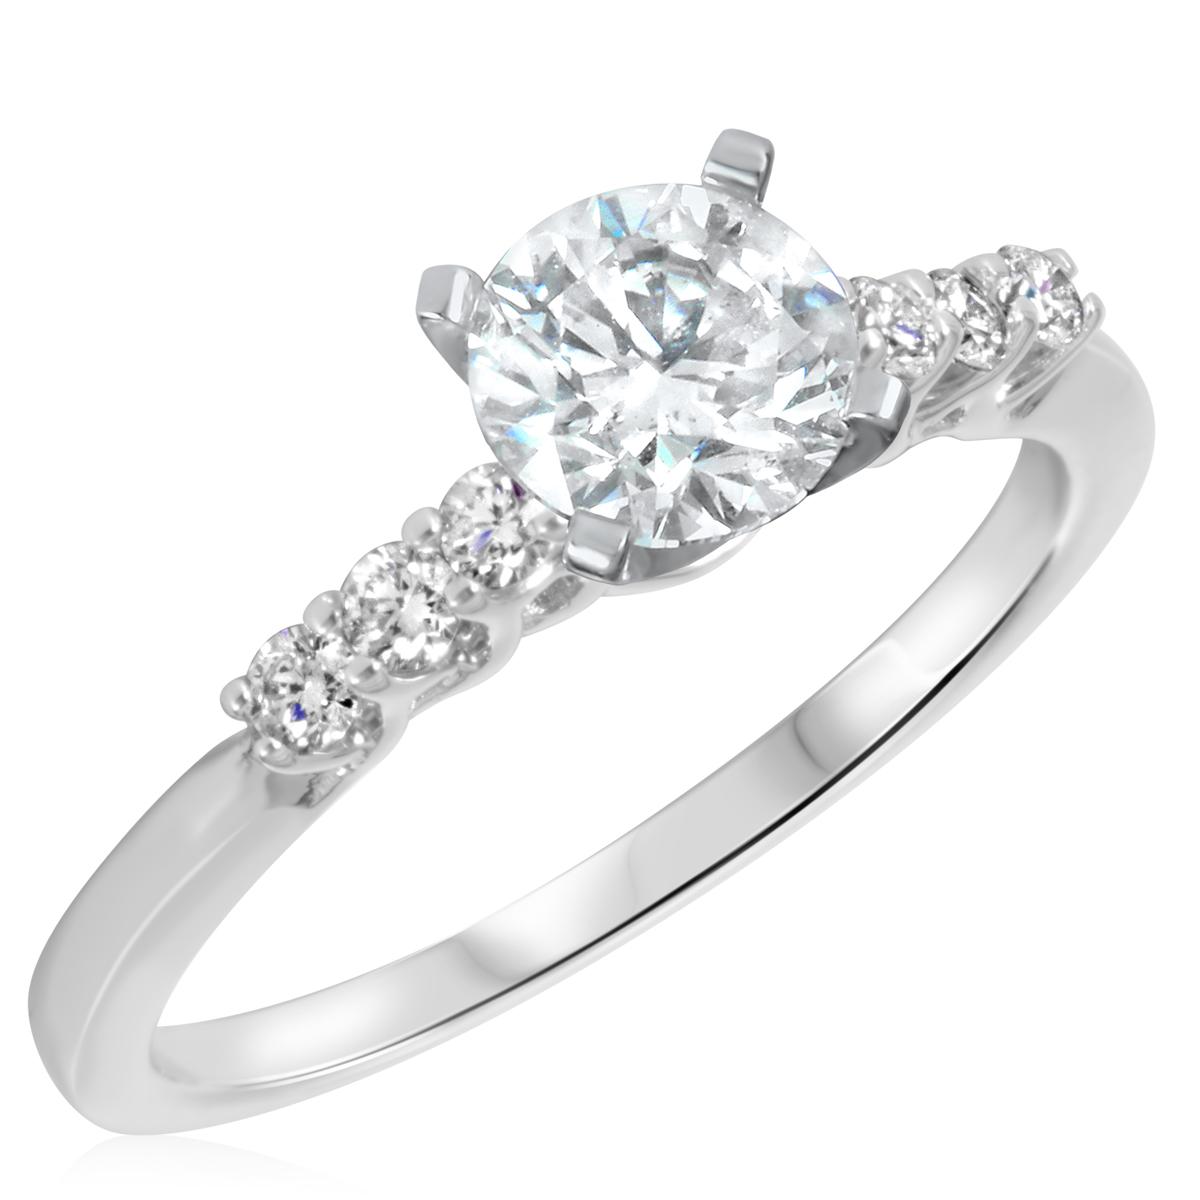 1 1/5 CT. T.W. Diamond Ladies Engagement Ring 10K White Gold- Size 8